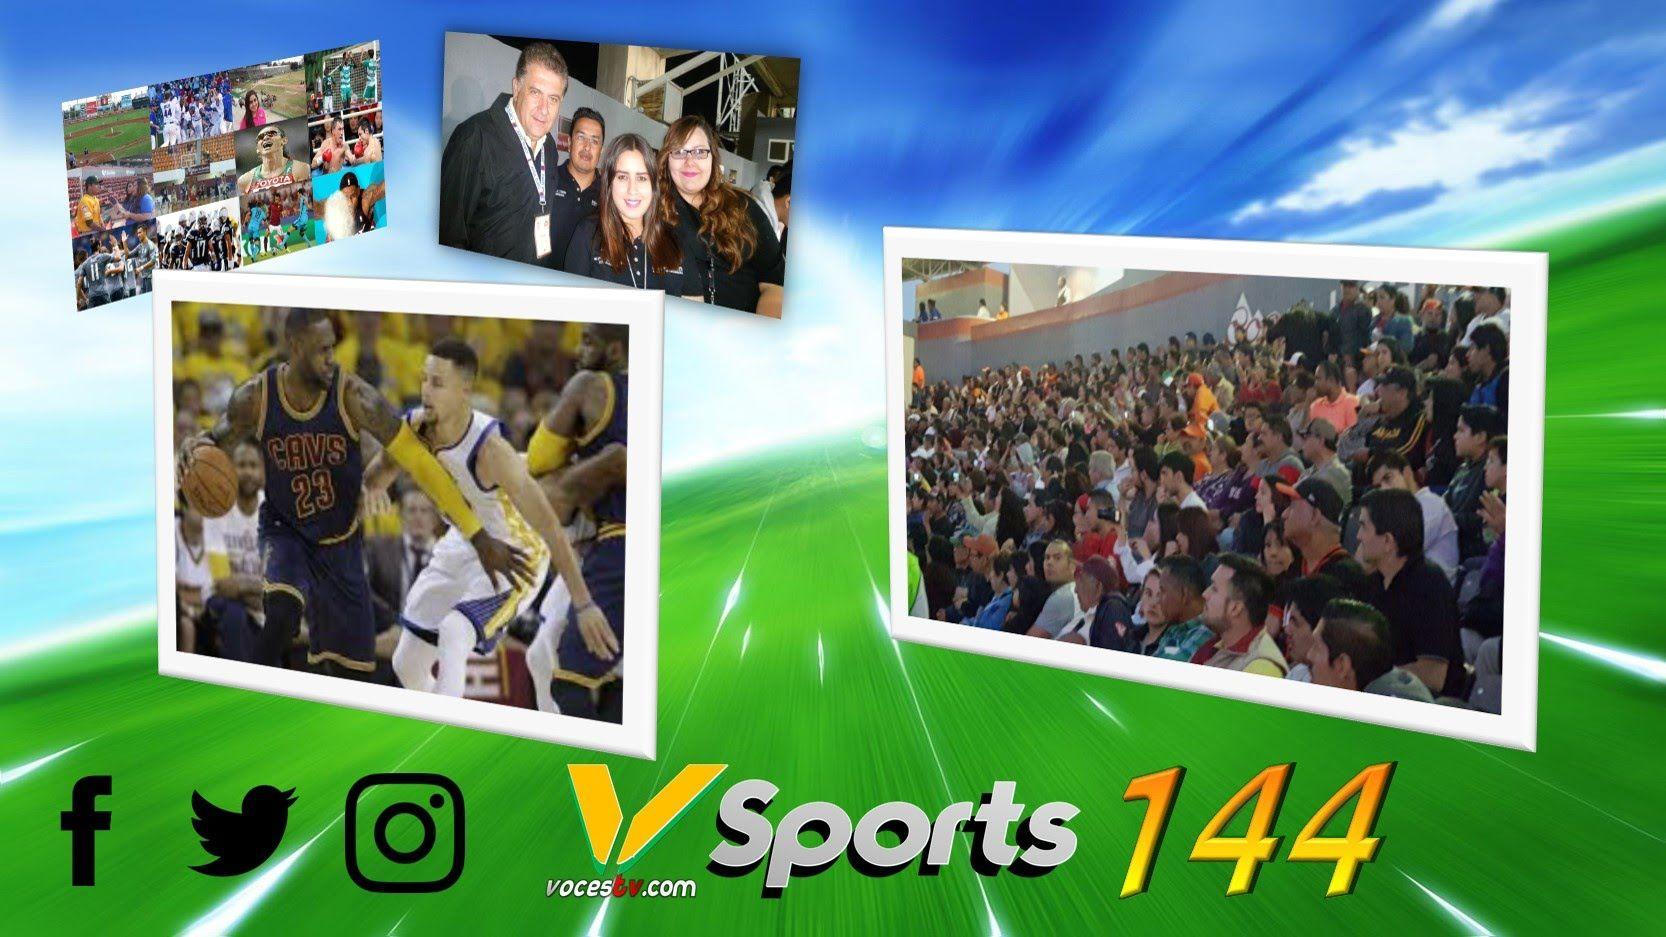 @vsports 144 // #RINCONVAQUERO @REDVAQUEROS // @NBAMEX #THEFINALS